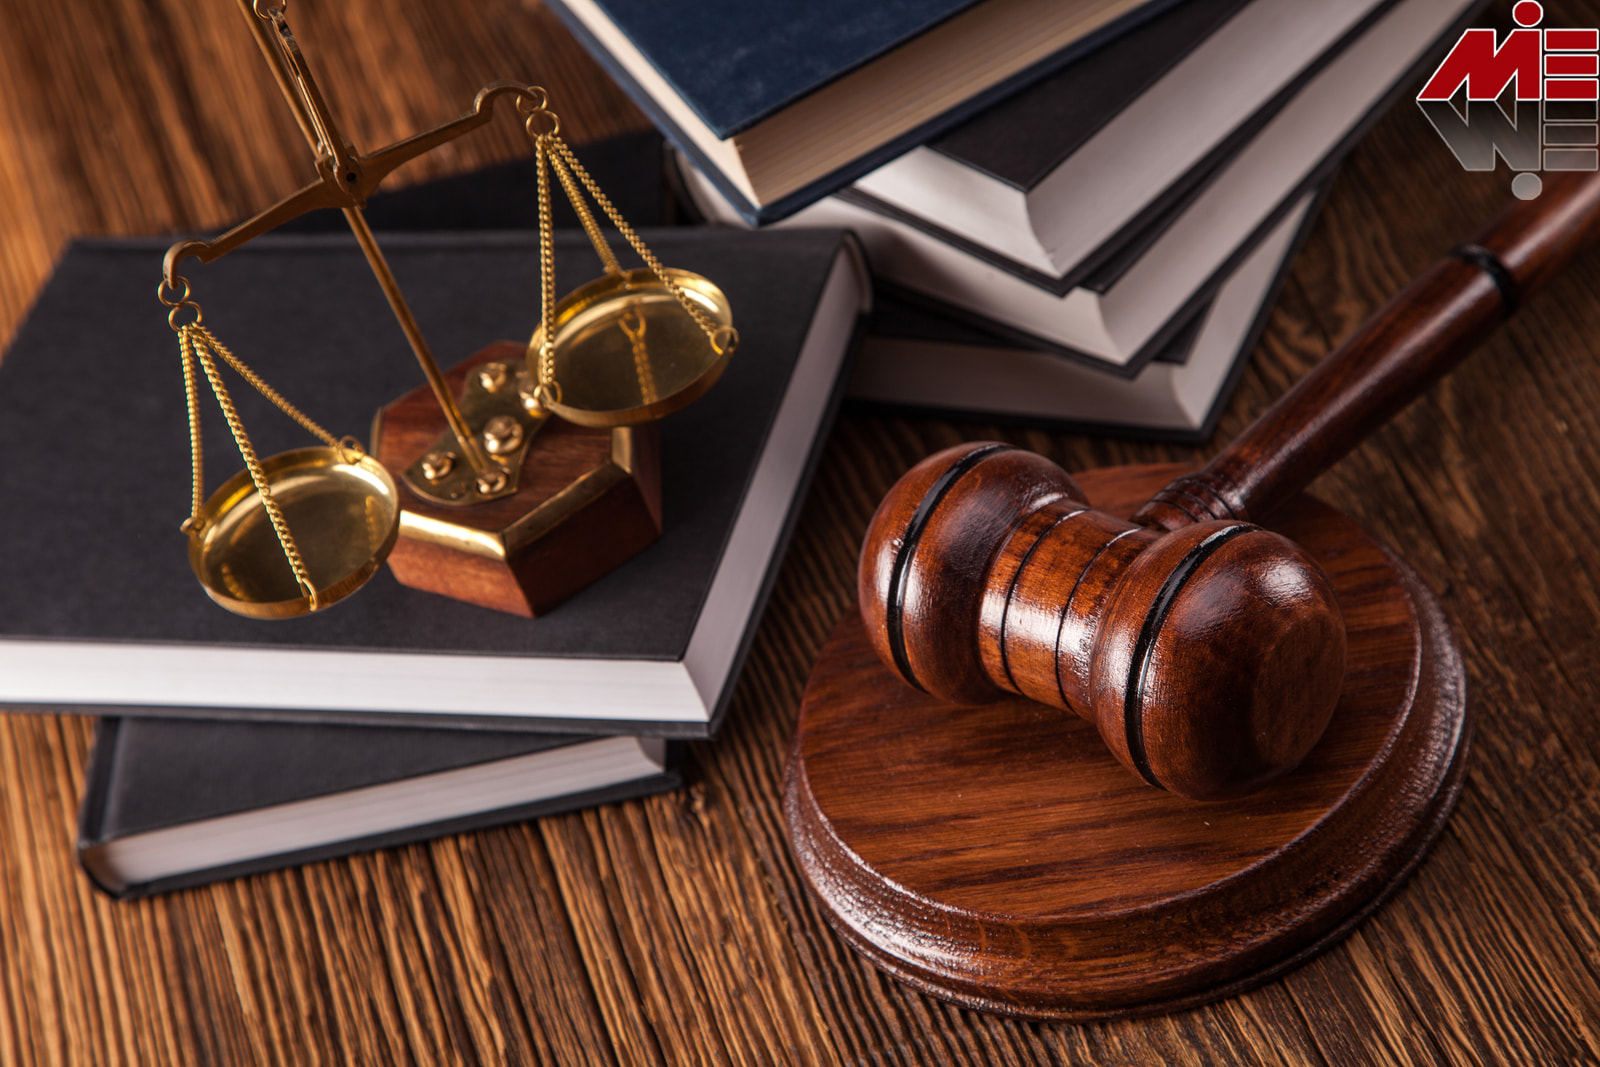 56fdc5491b2fe9.62614080 وکیل مهاجرت در بلاروس